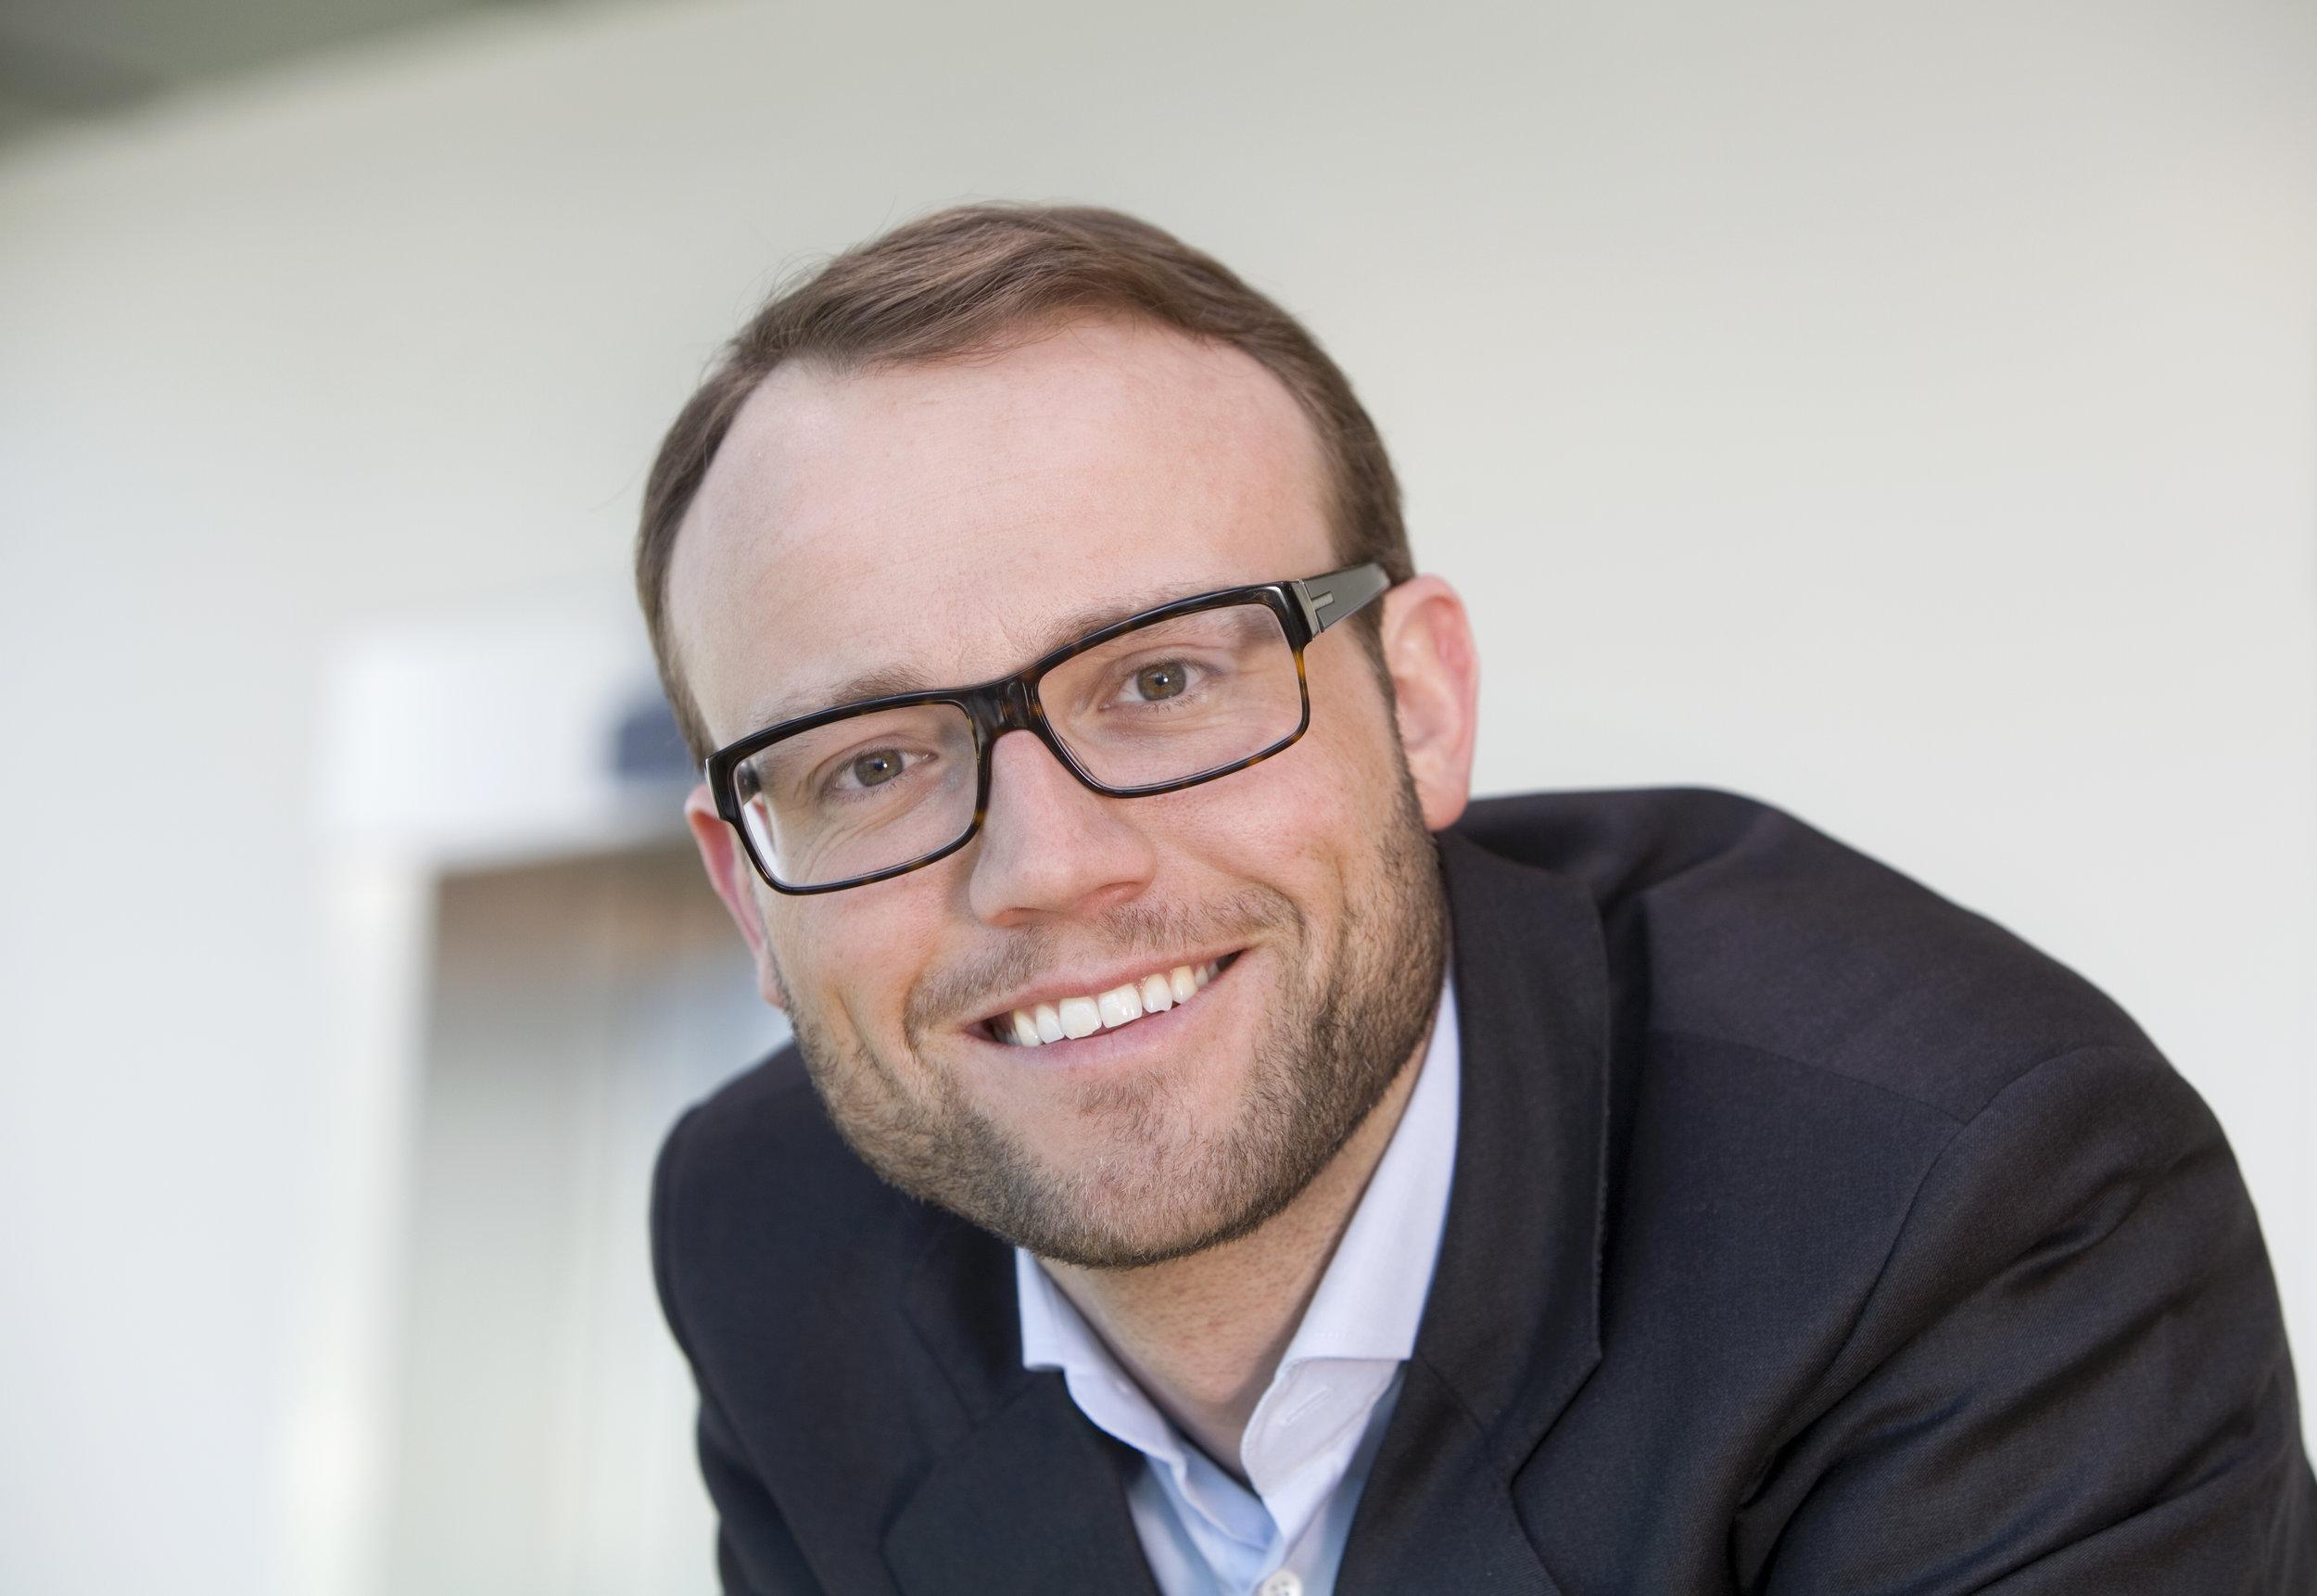 Jannik Krohn Falck, Adm.dir, Great Place to Work Norge